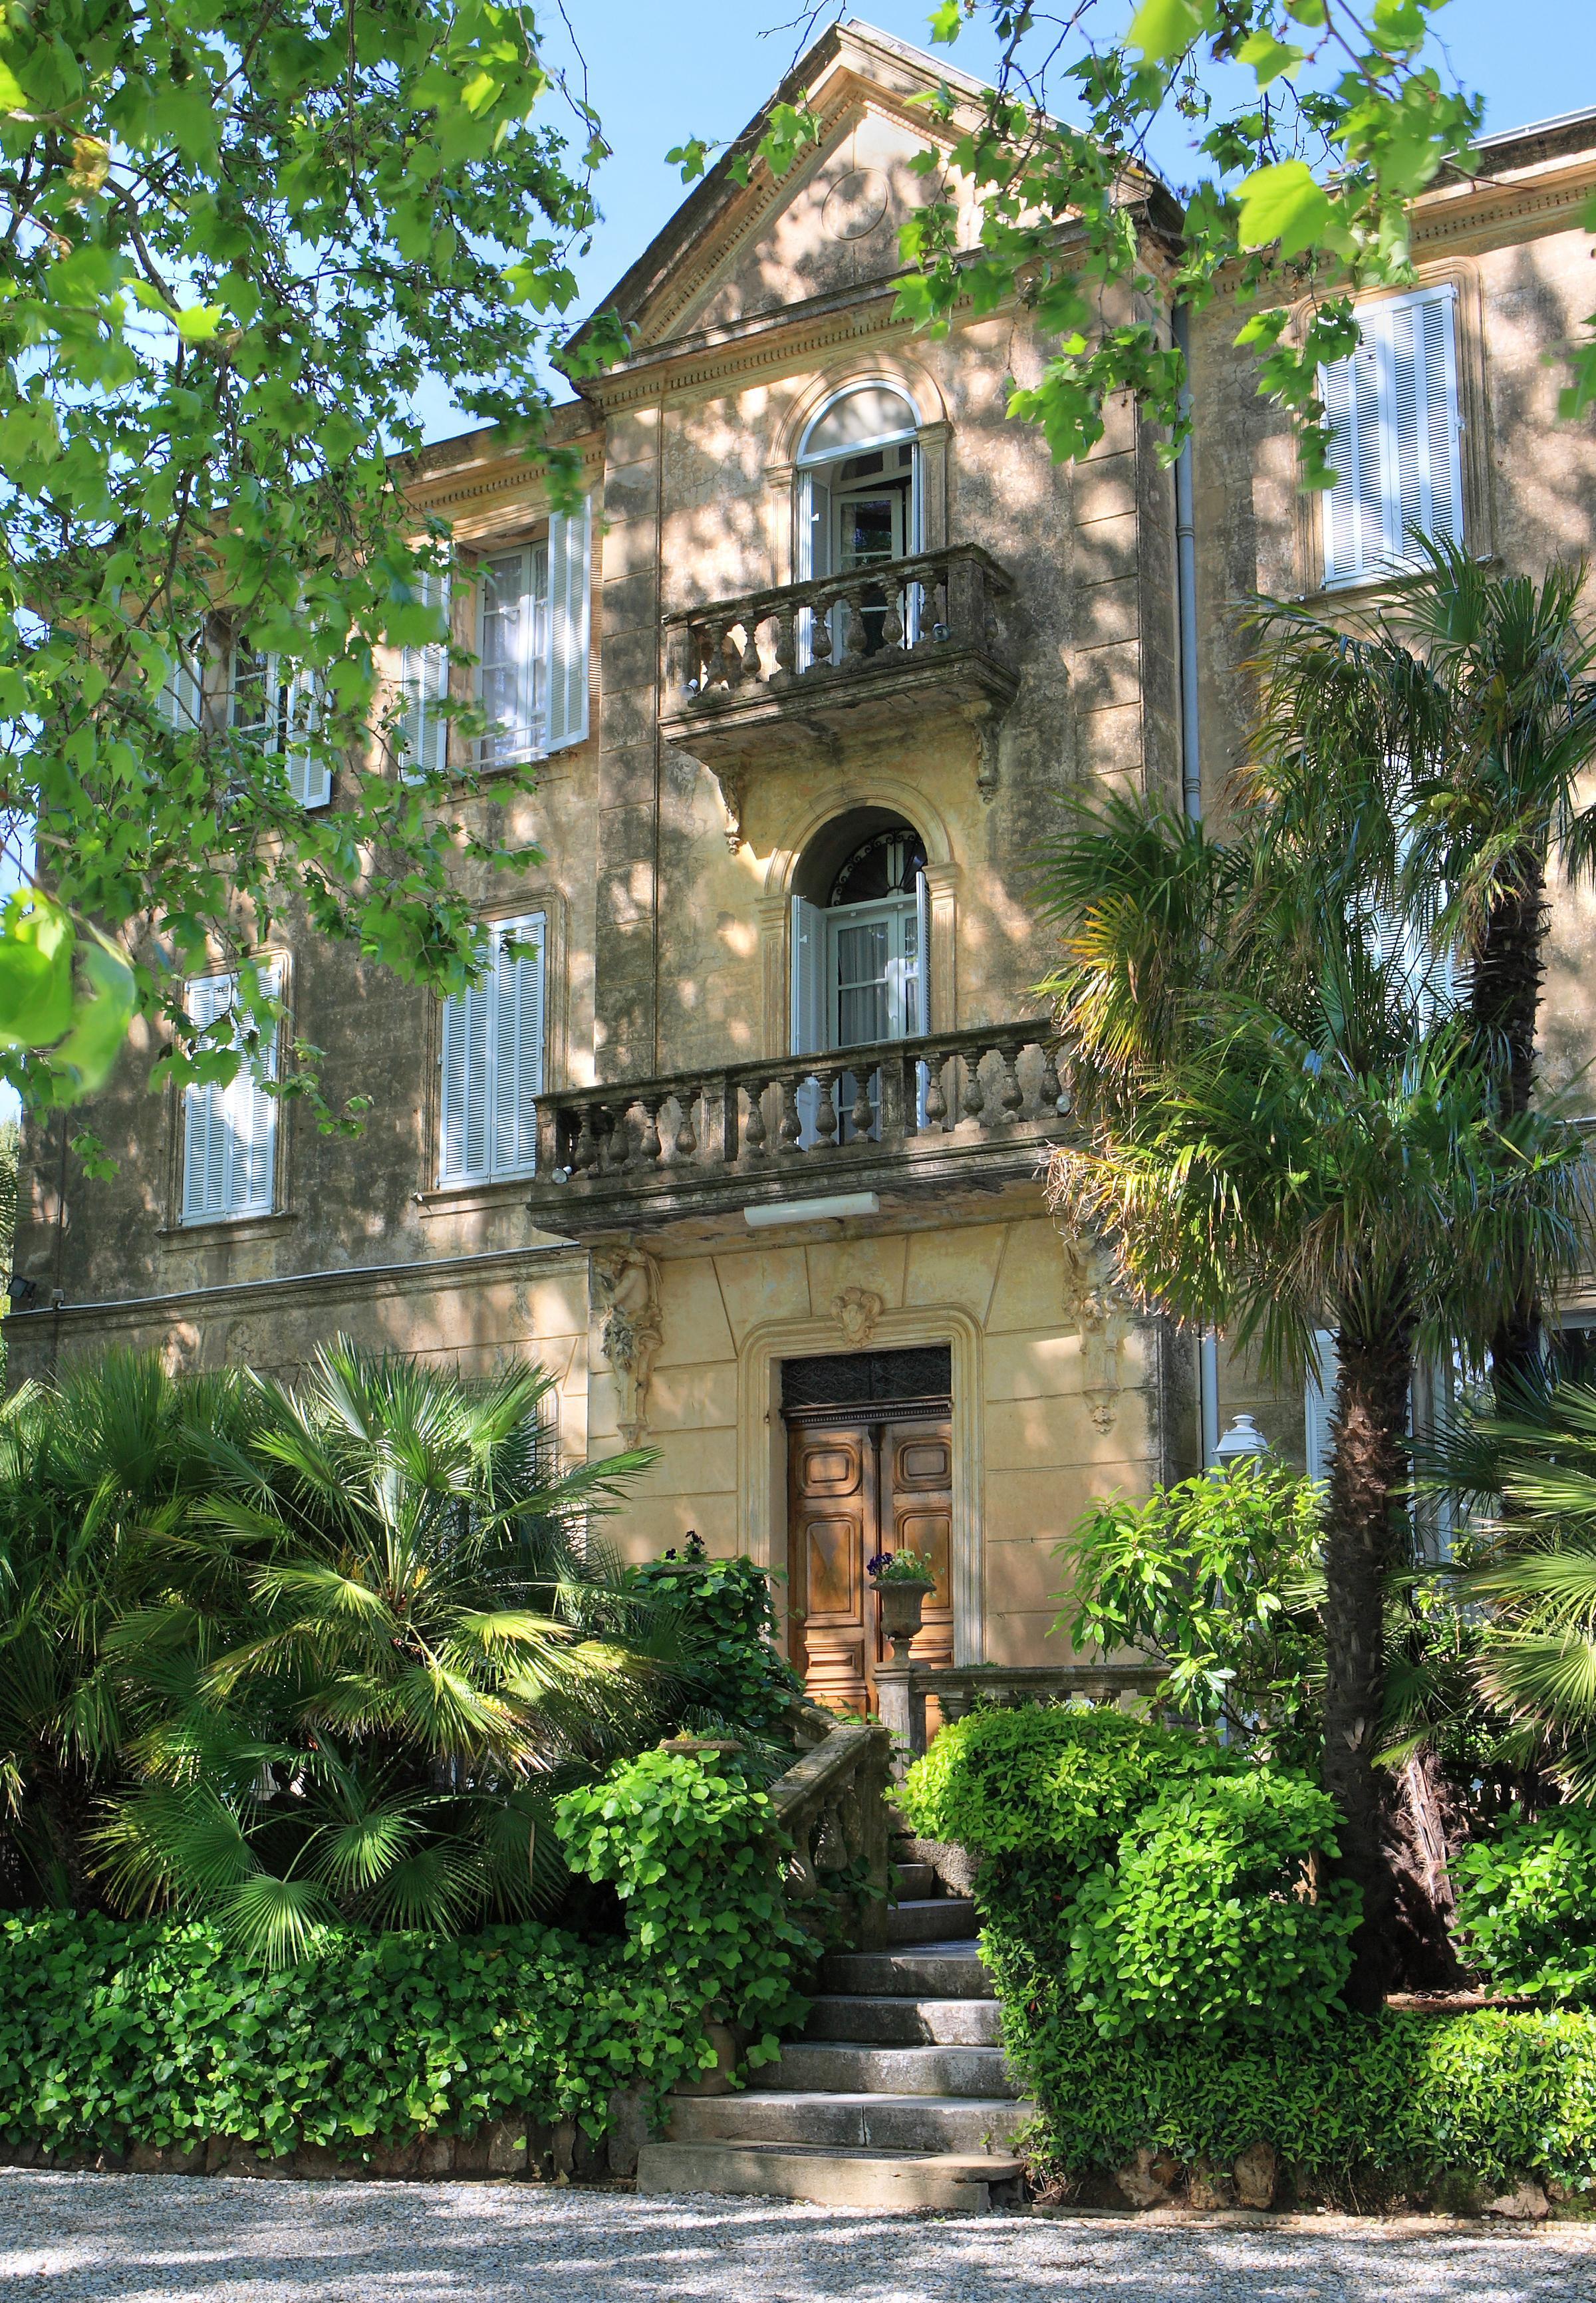 https://a.storyblok.com/f/105614/2384x3440/92d465eea6/chateau-minuty.JPG